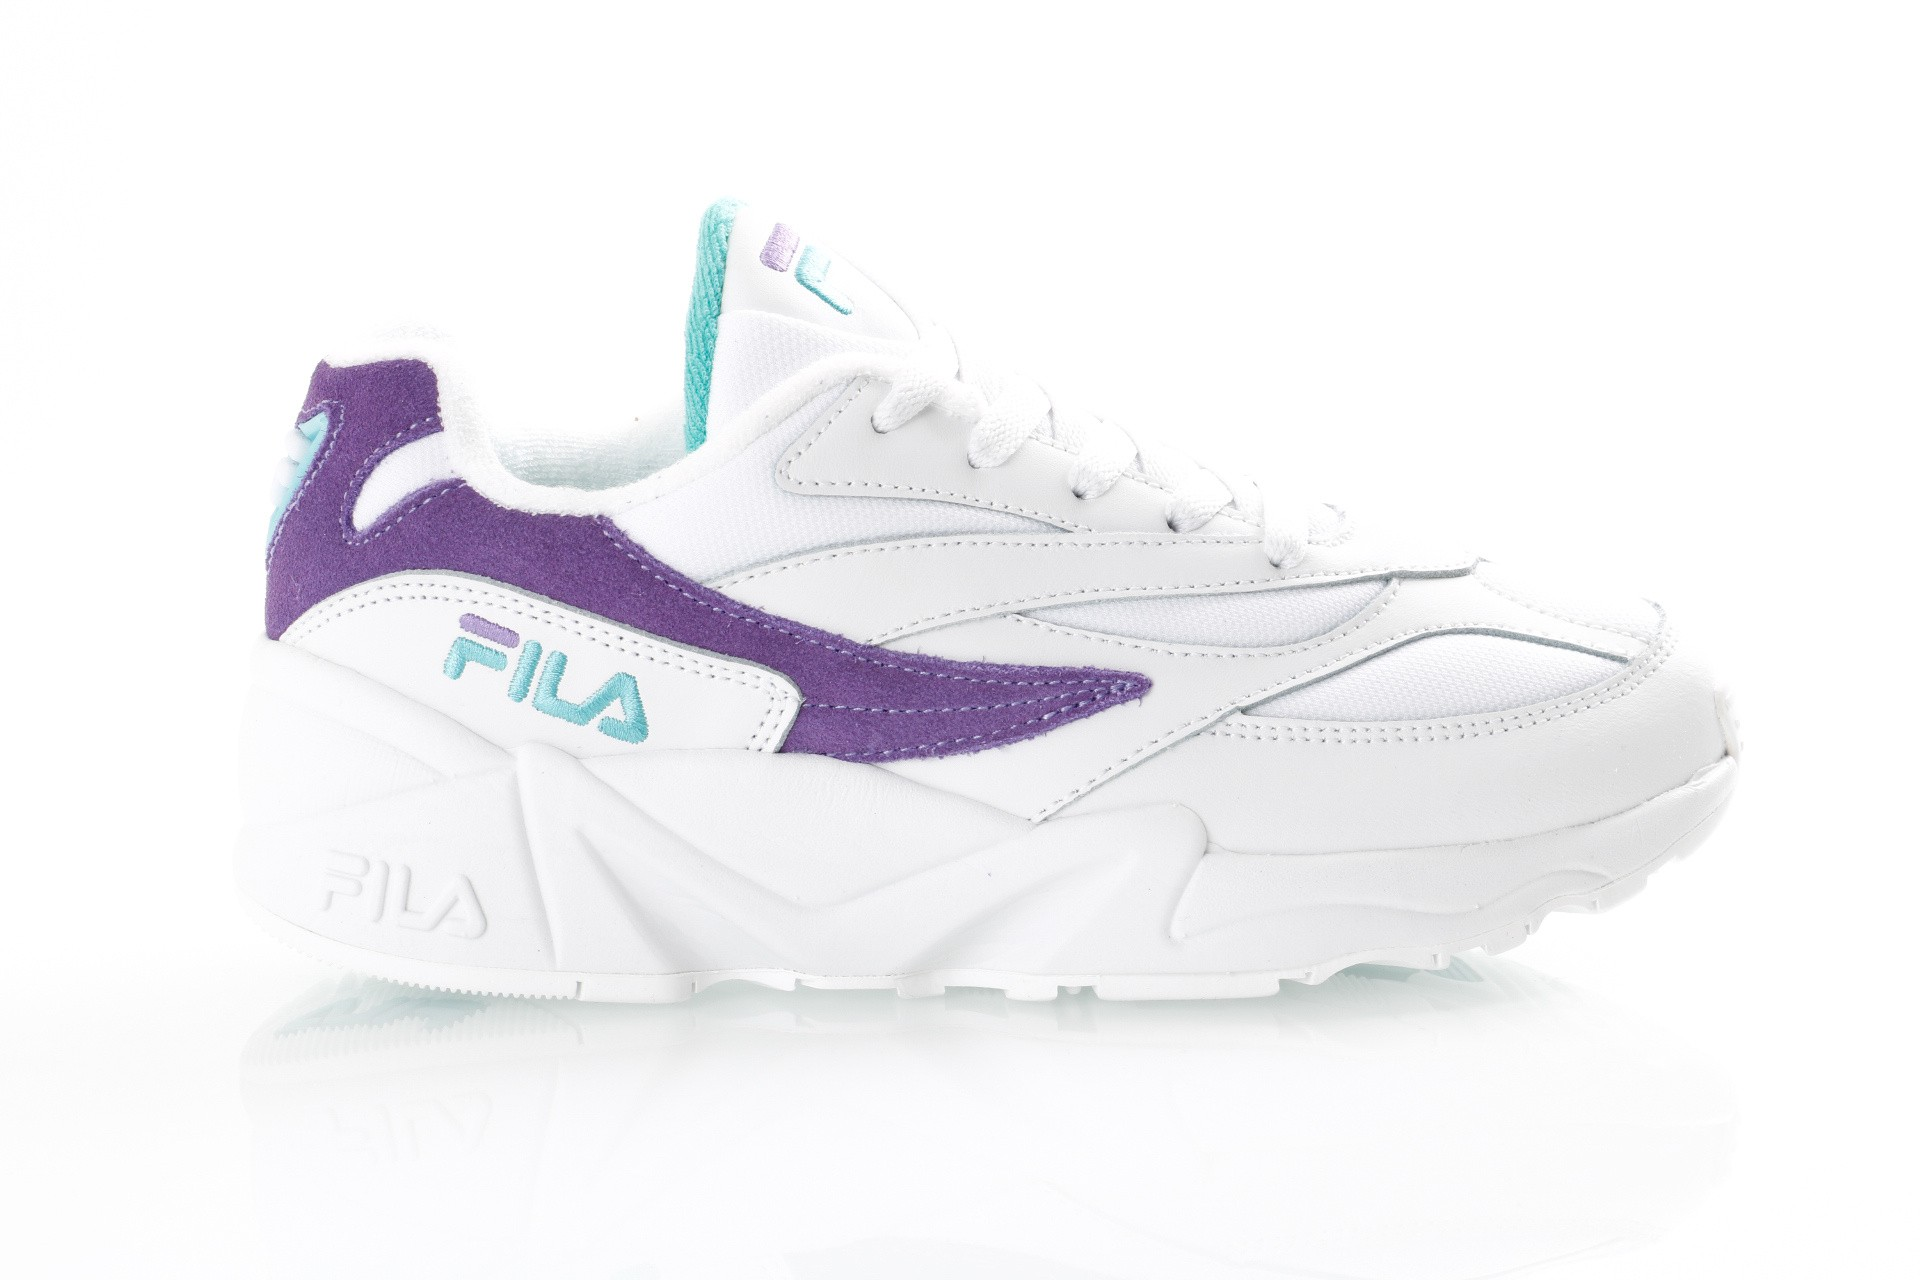 Foto van Fila V94M Low Wmn 1010602 Sneakers White/Violet Tulip / Blue Curacao